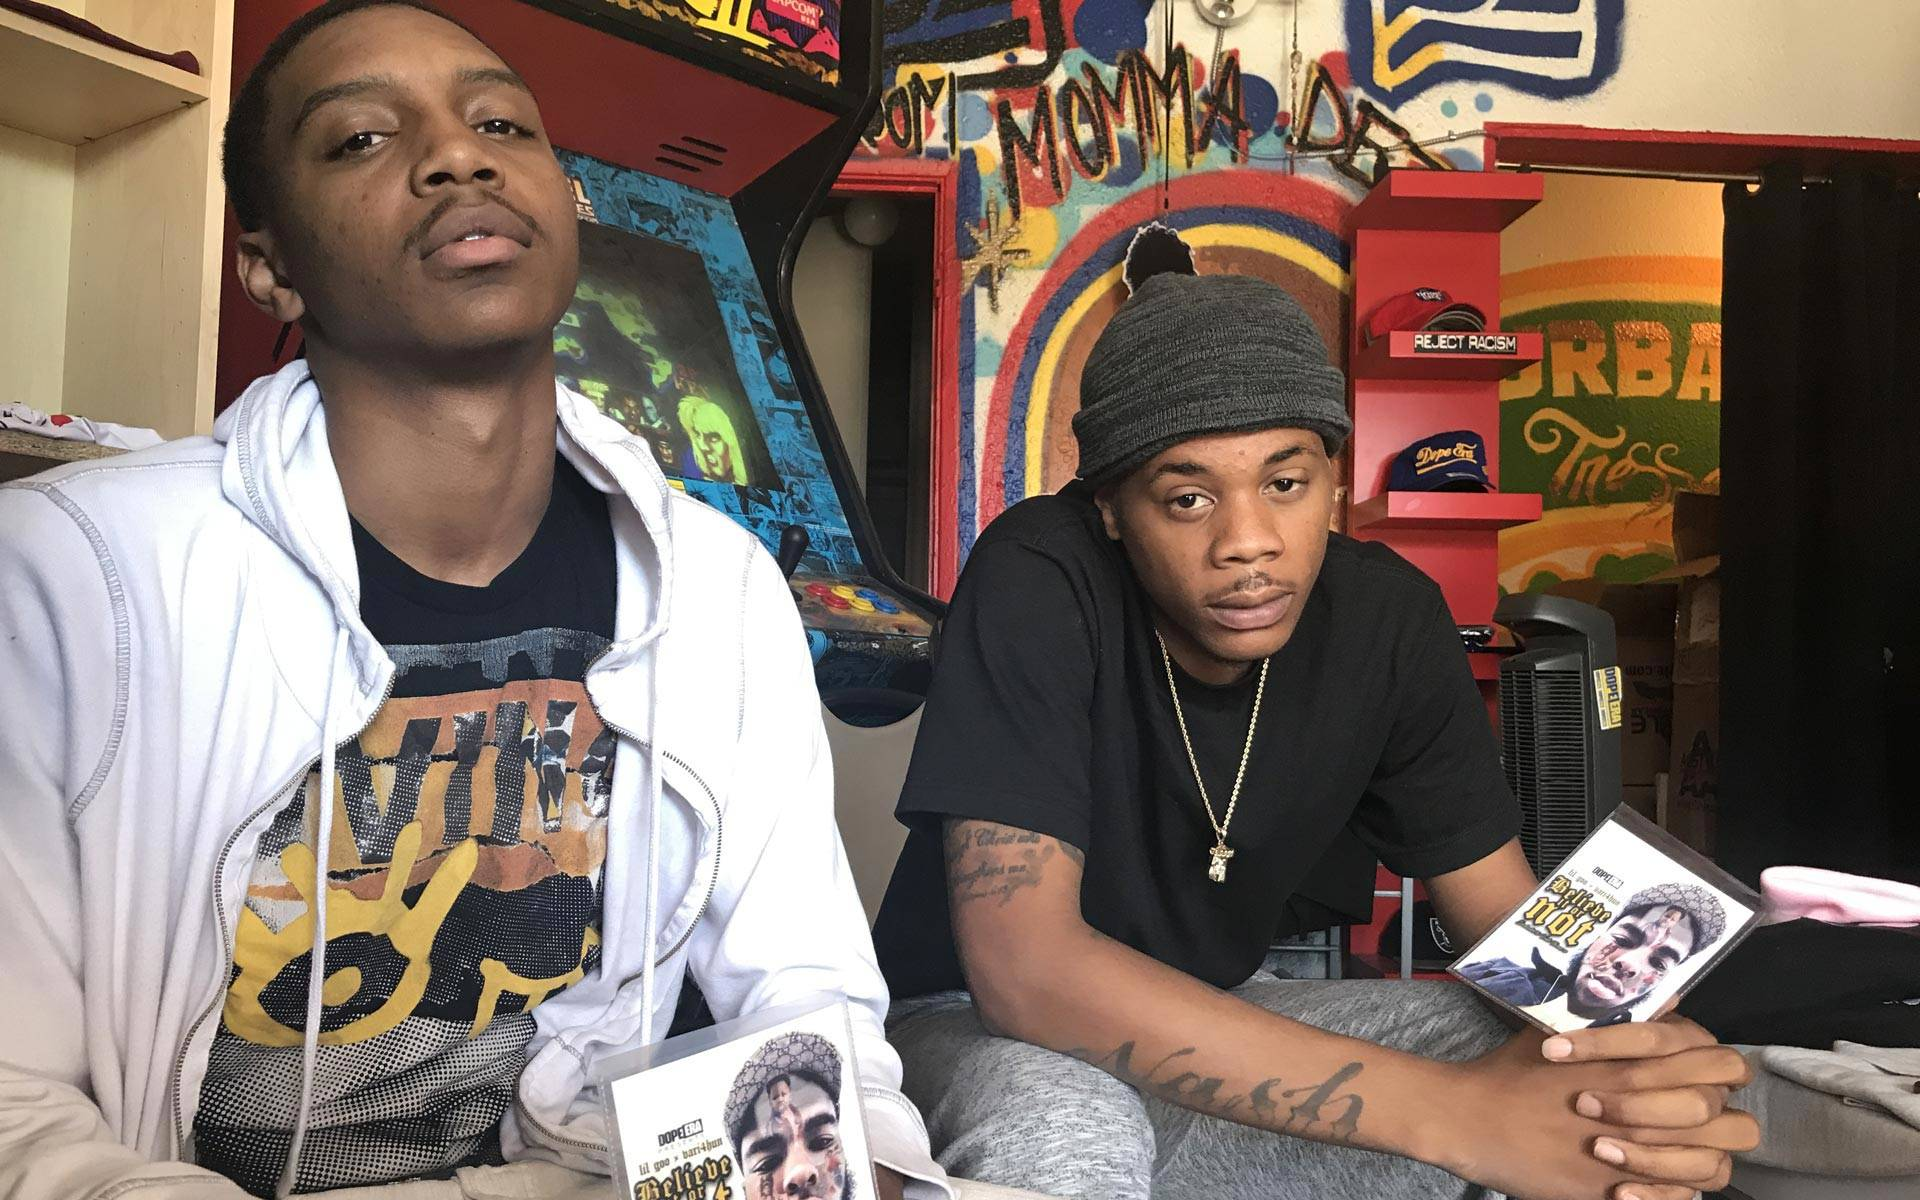 Lil Goo and Vari4Hun at Dope Era in Oakland, holding copies of their album honoring Devonte Thomas. Pendarvis Harshaw